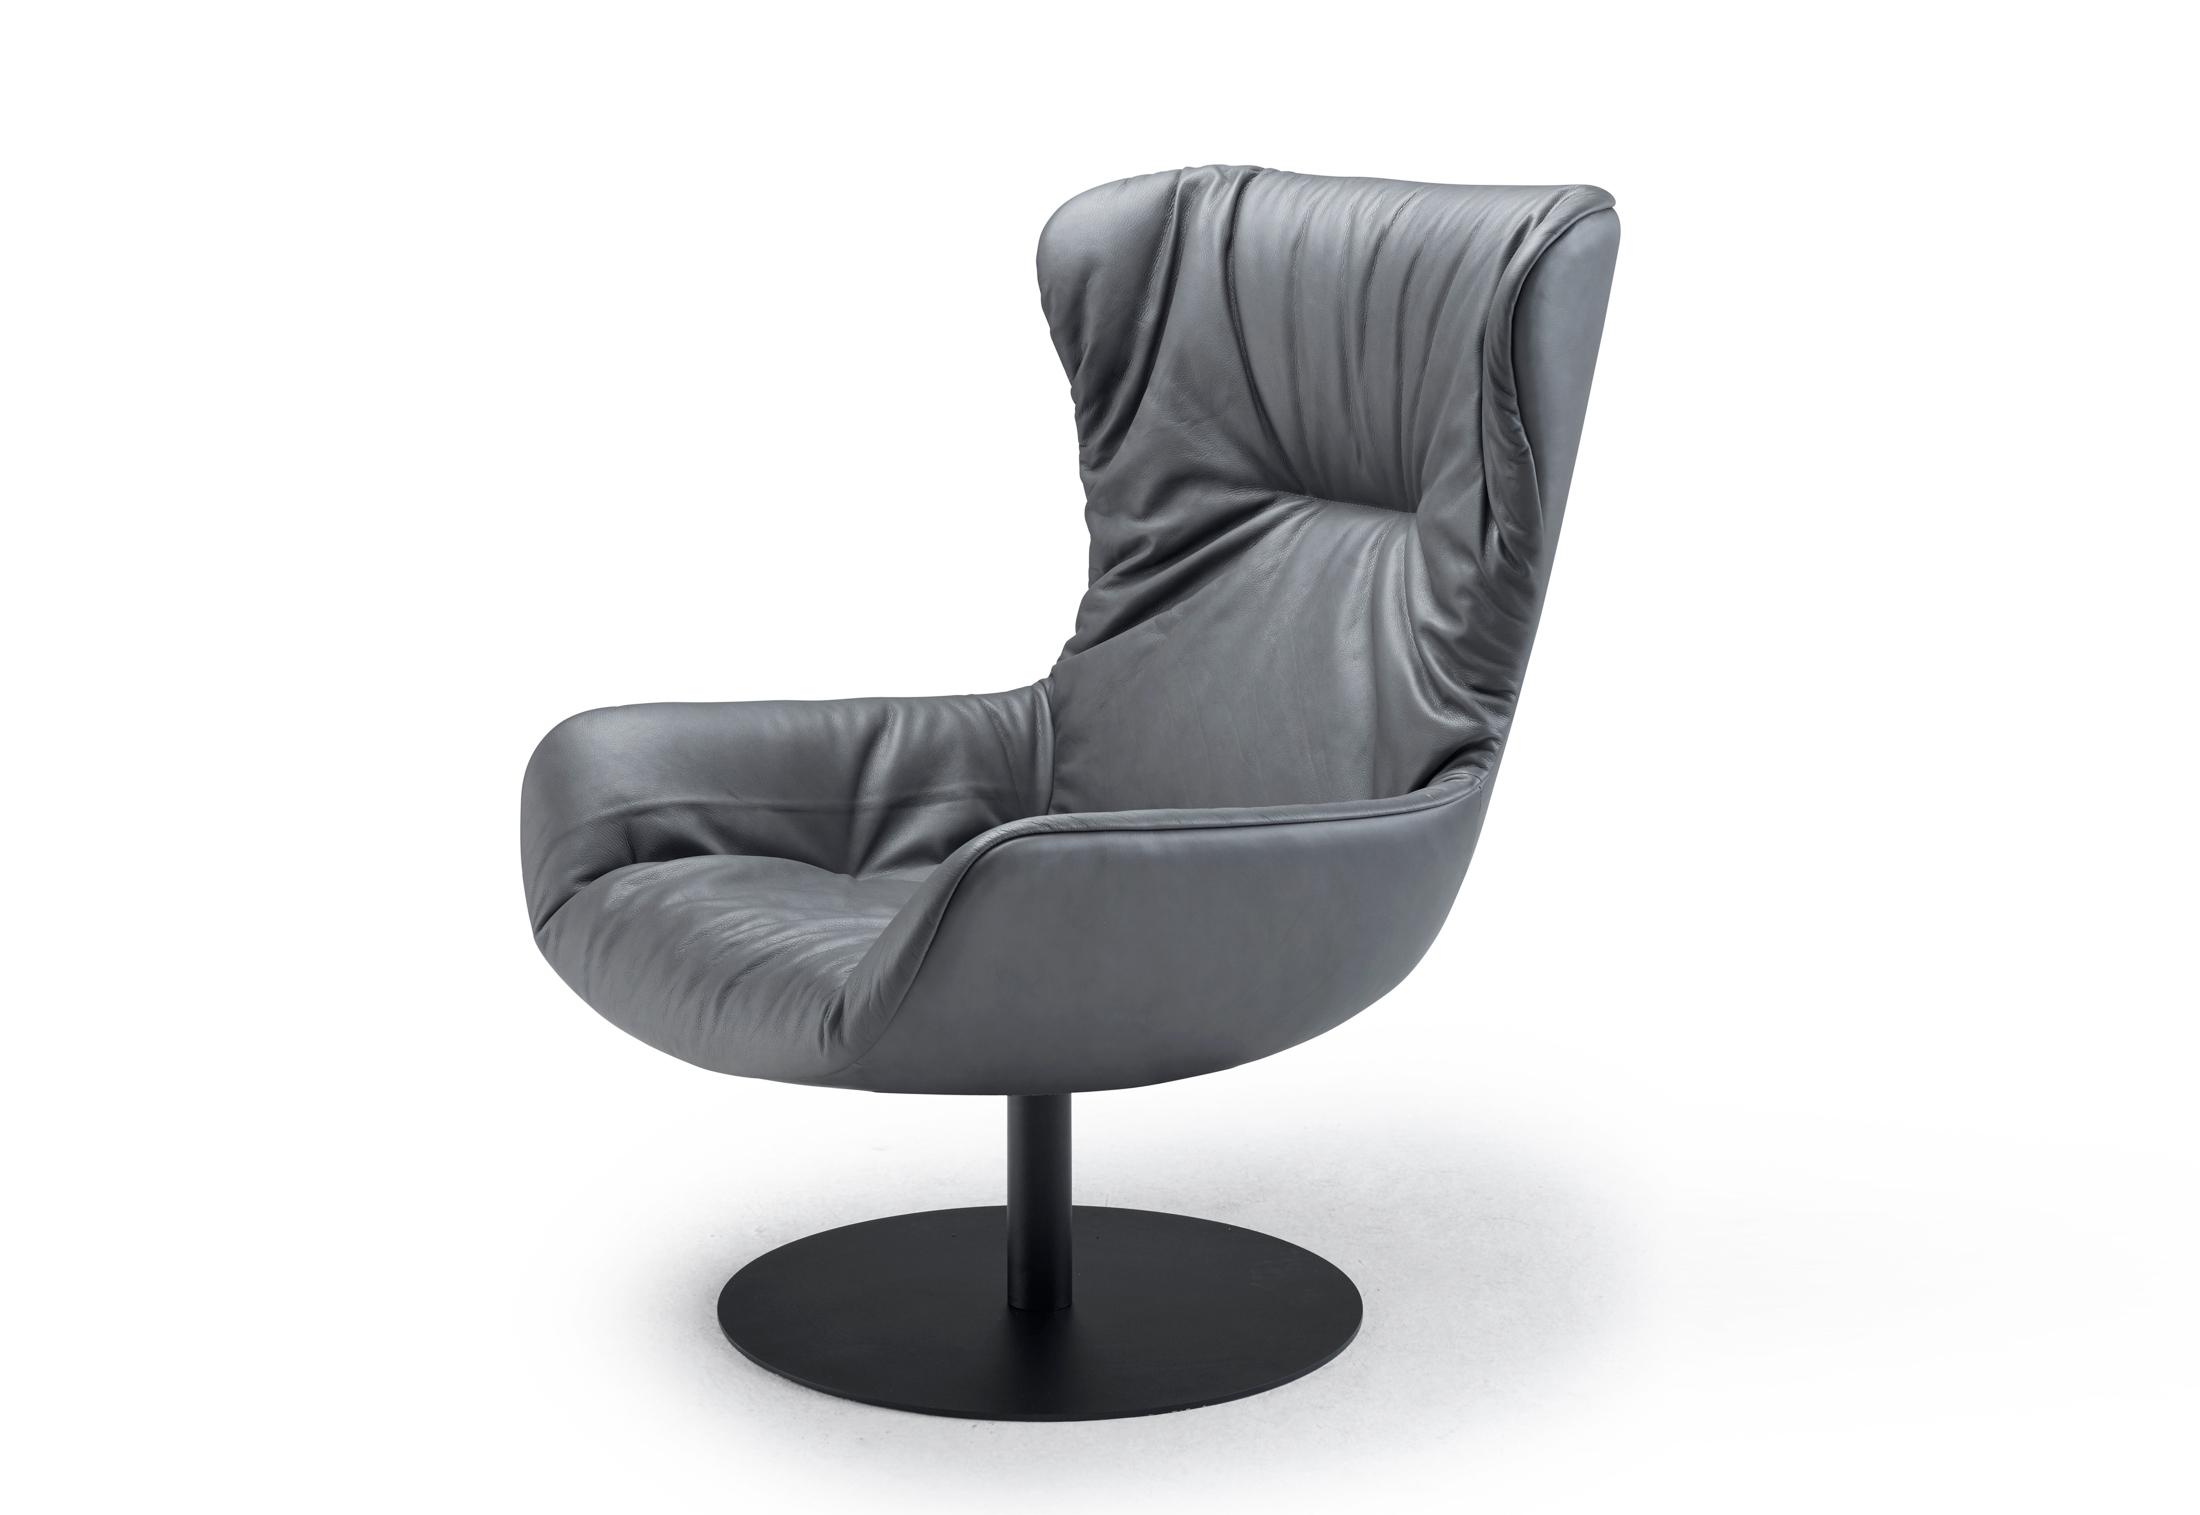 Leya Wingback Chair With Central Leg By Freifrau Stylepark